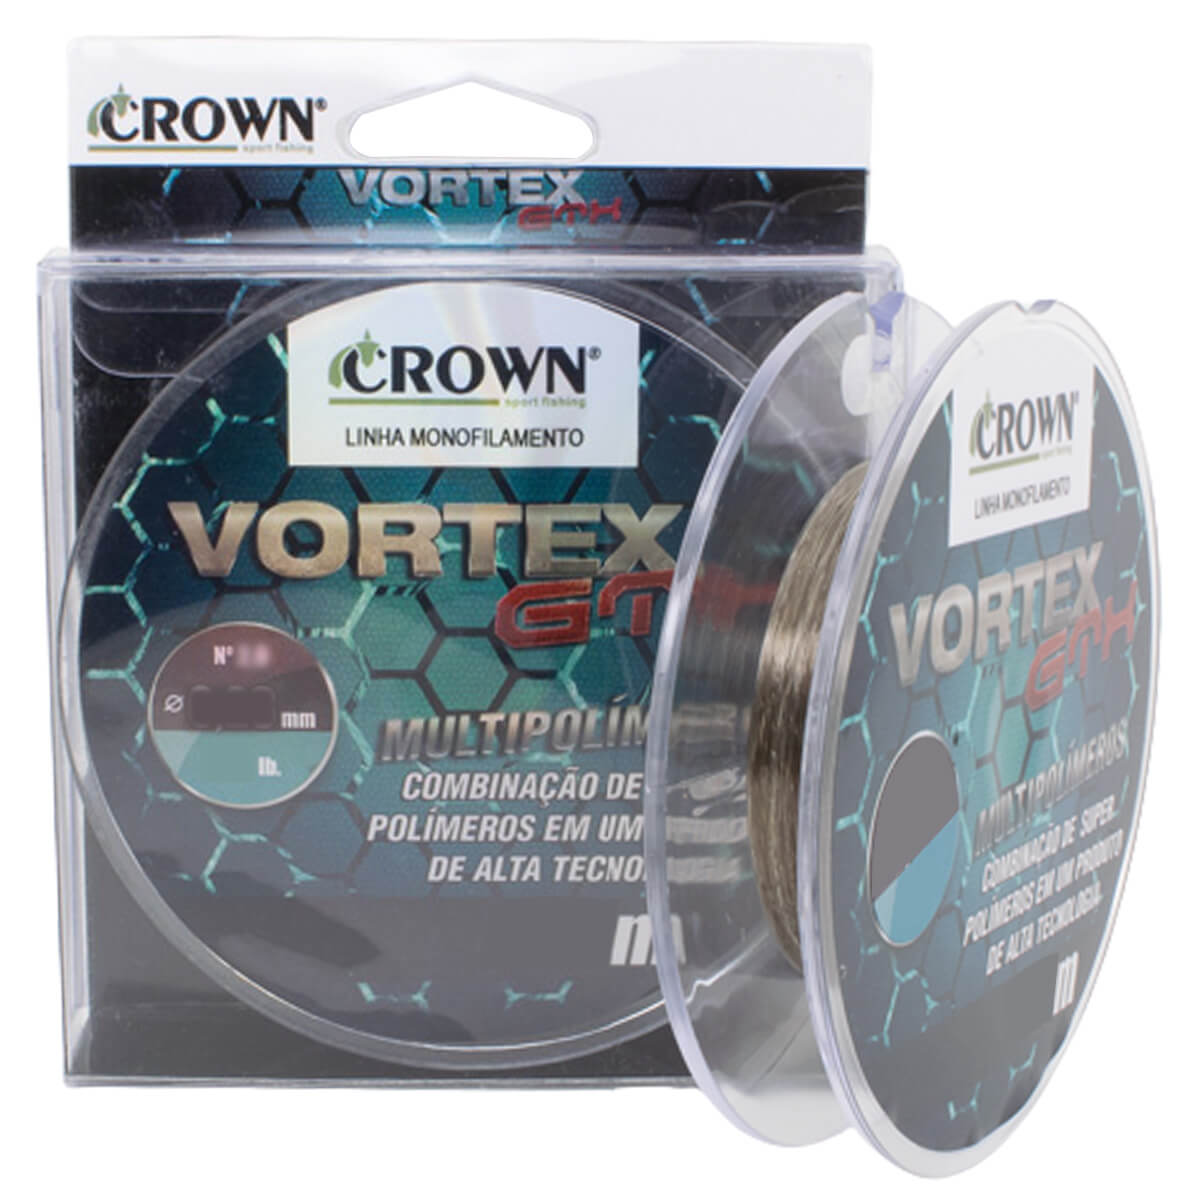 LINHA MONOFILAMENTO CROWN VORTEX GTX 0,23MM - 300M